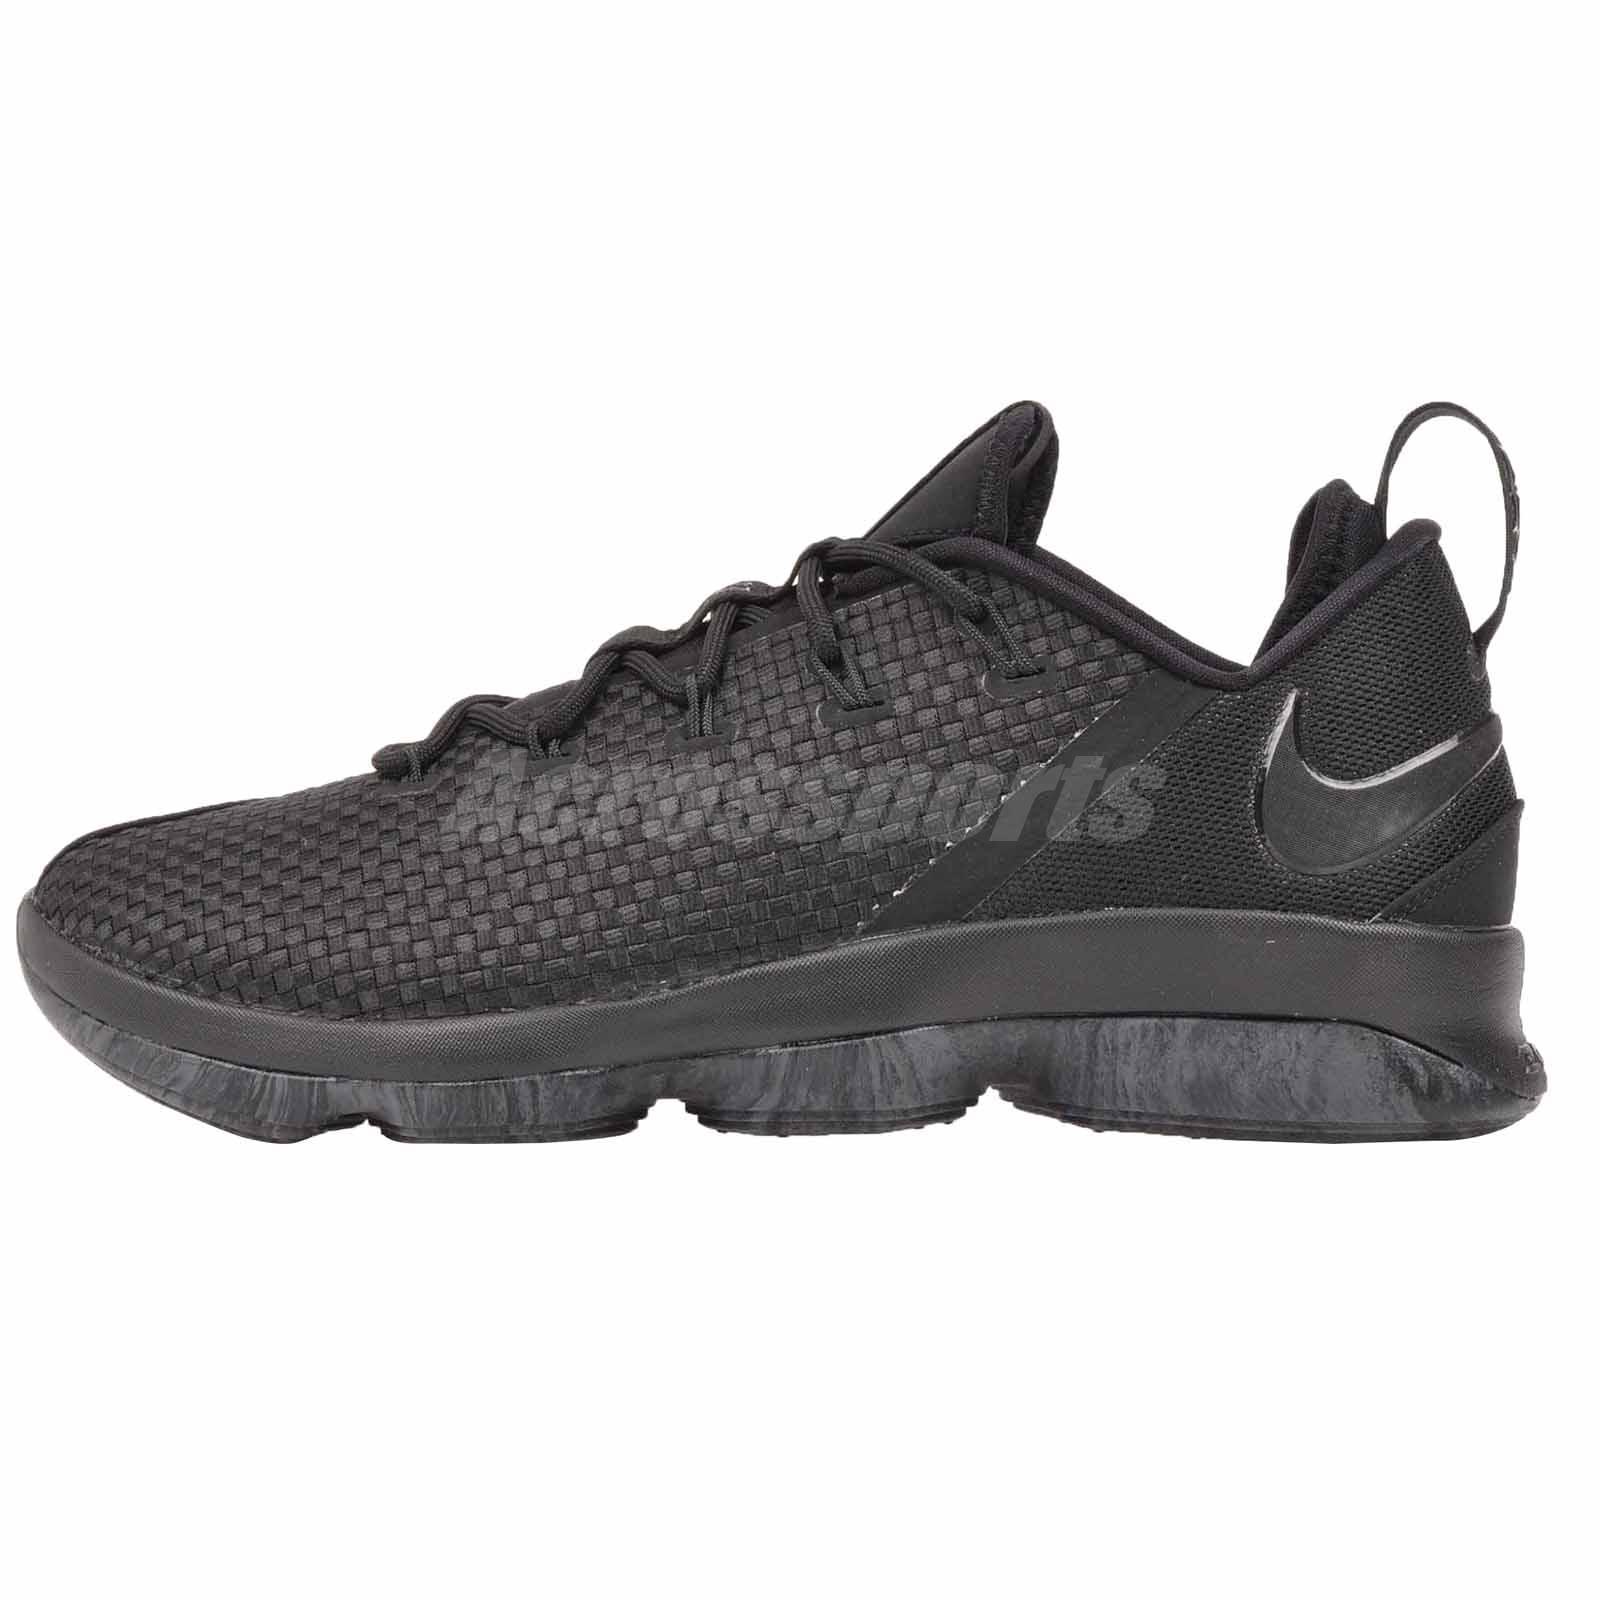 d55032d660b43 Details about Nike Lebron XIV Low Mens Basketball Shoes Black 878636-002